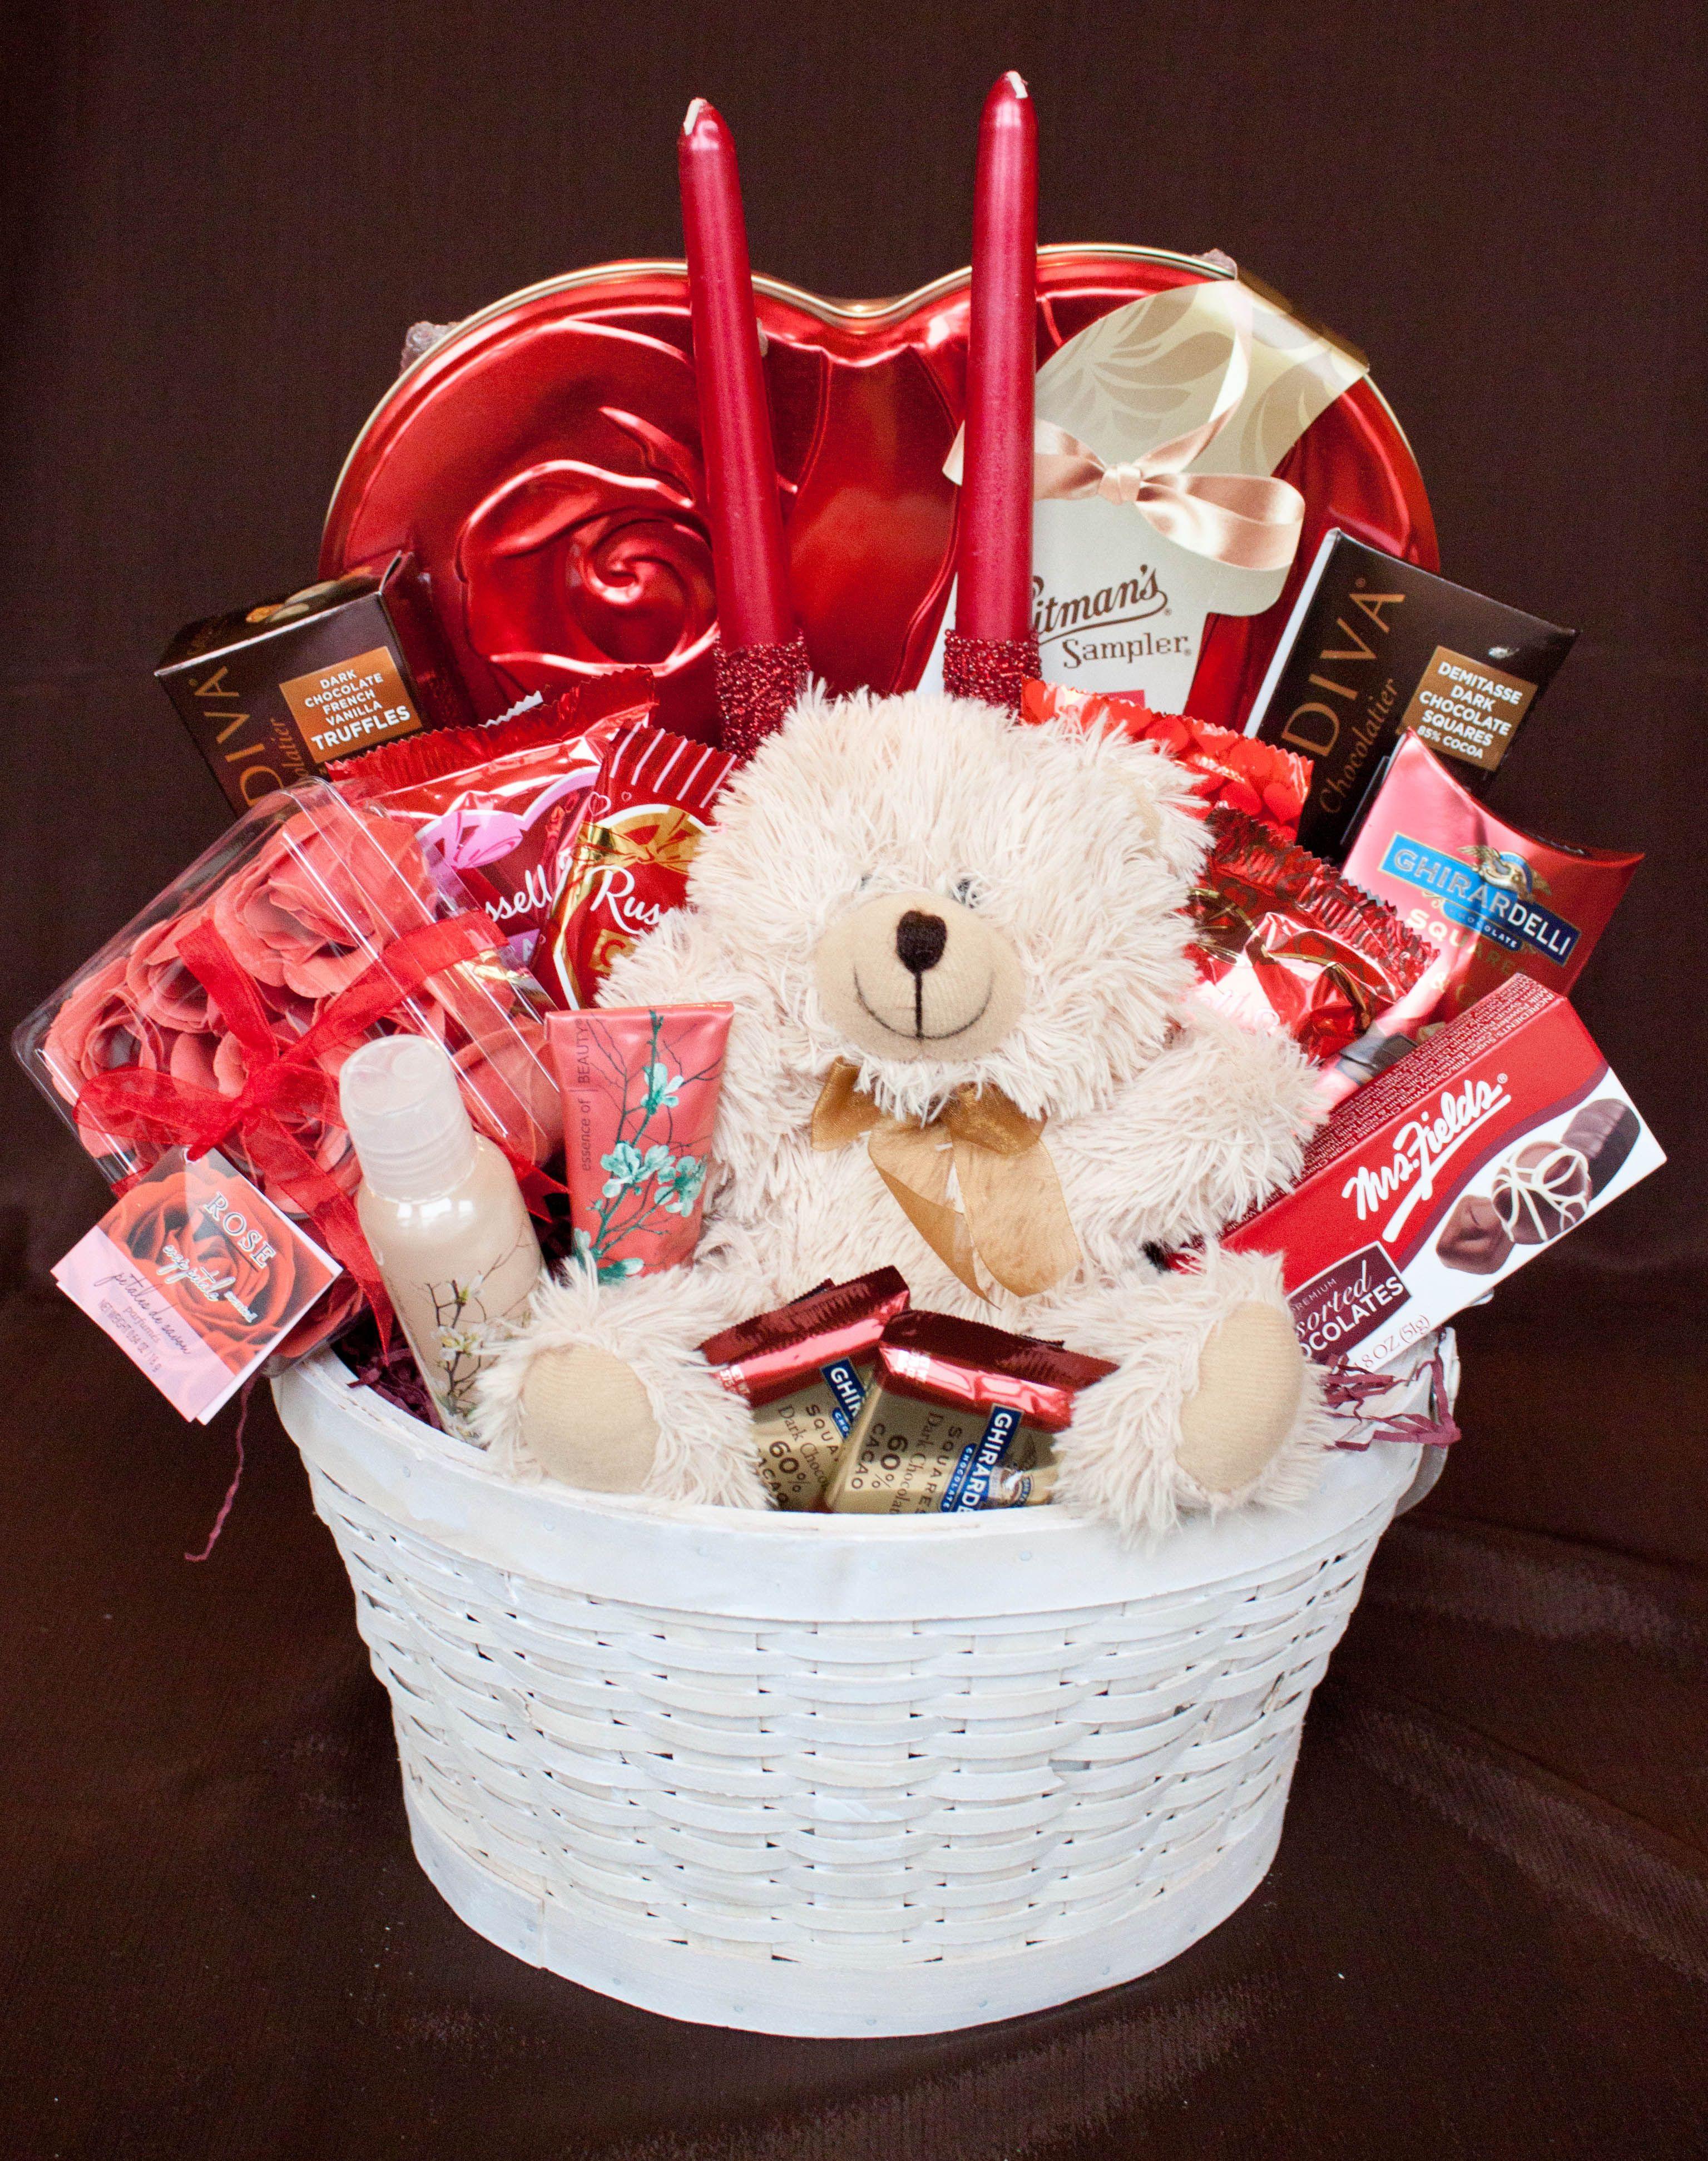 Valentine'S Day Gift Delivery Ideas  Valentine Basket Something Wonderful Baskets